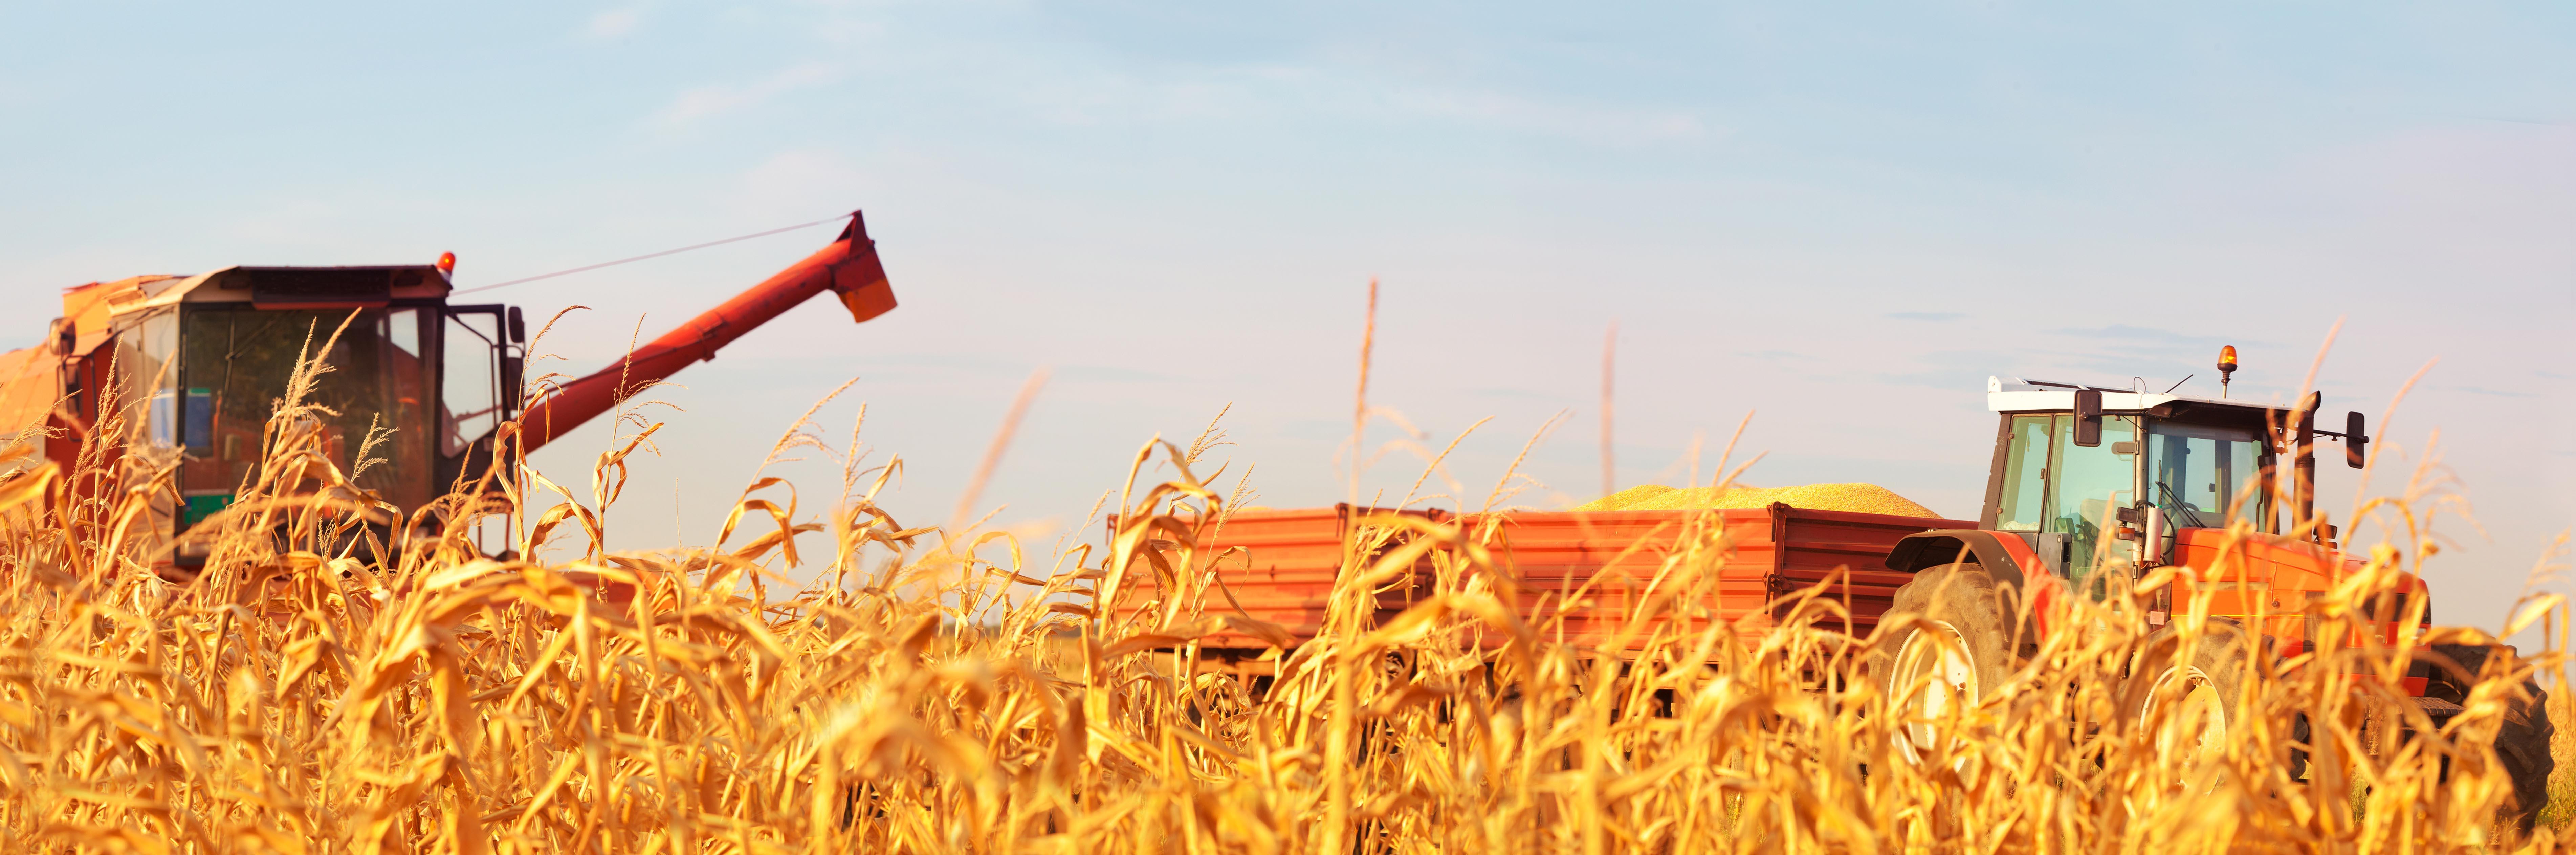 Farm harvest photo